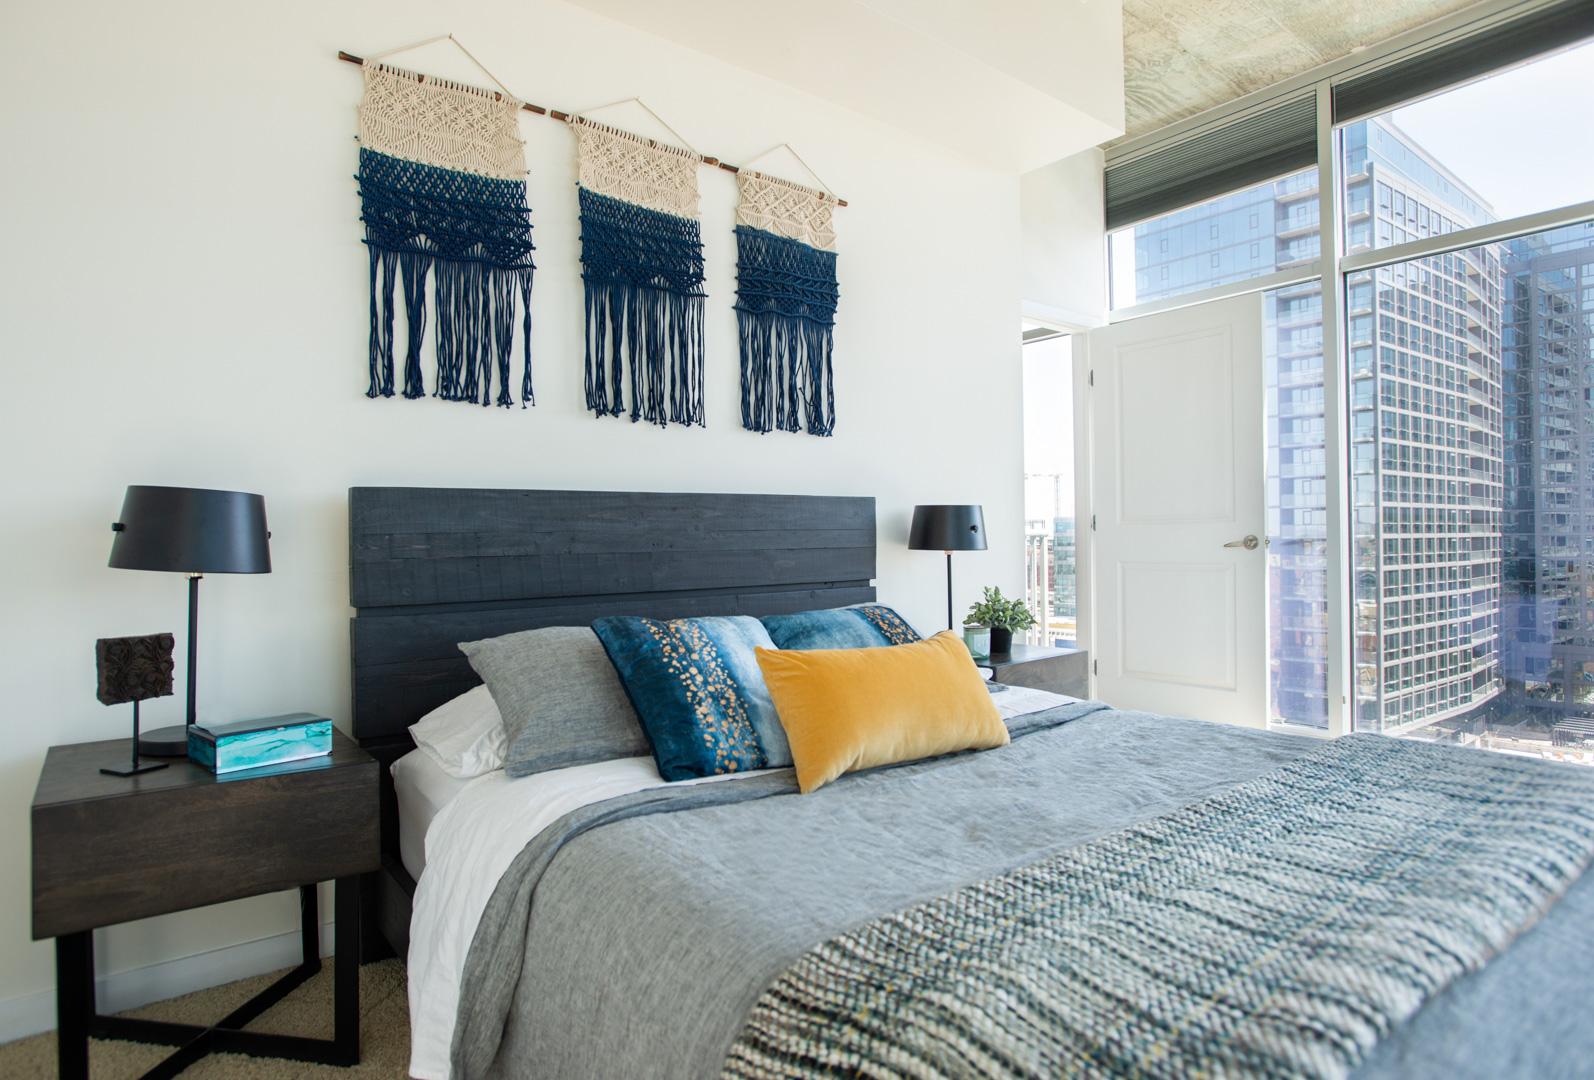 glass house bedroom with macramé art